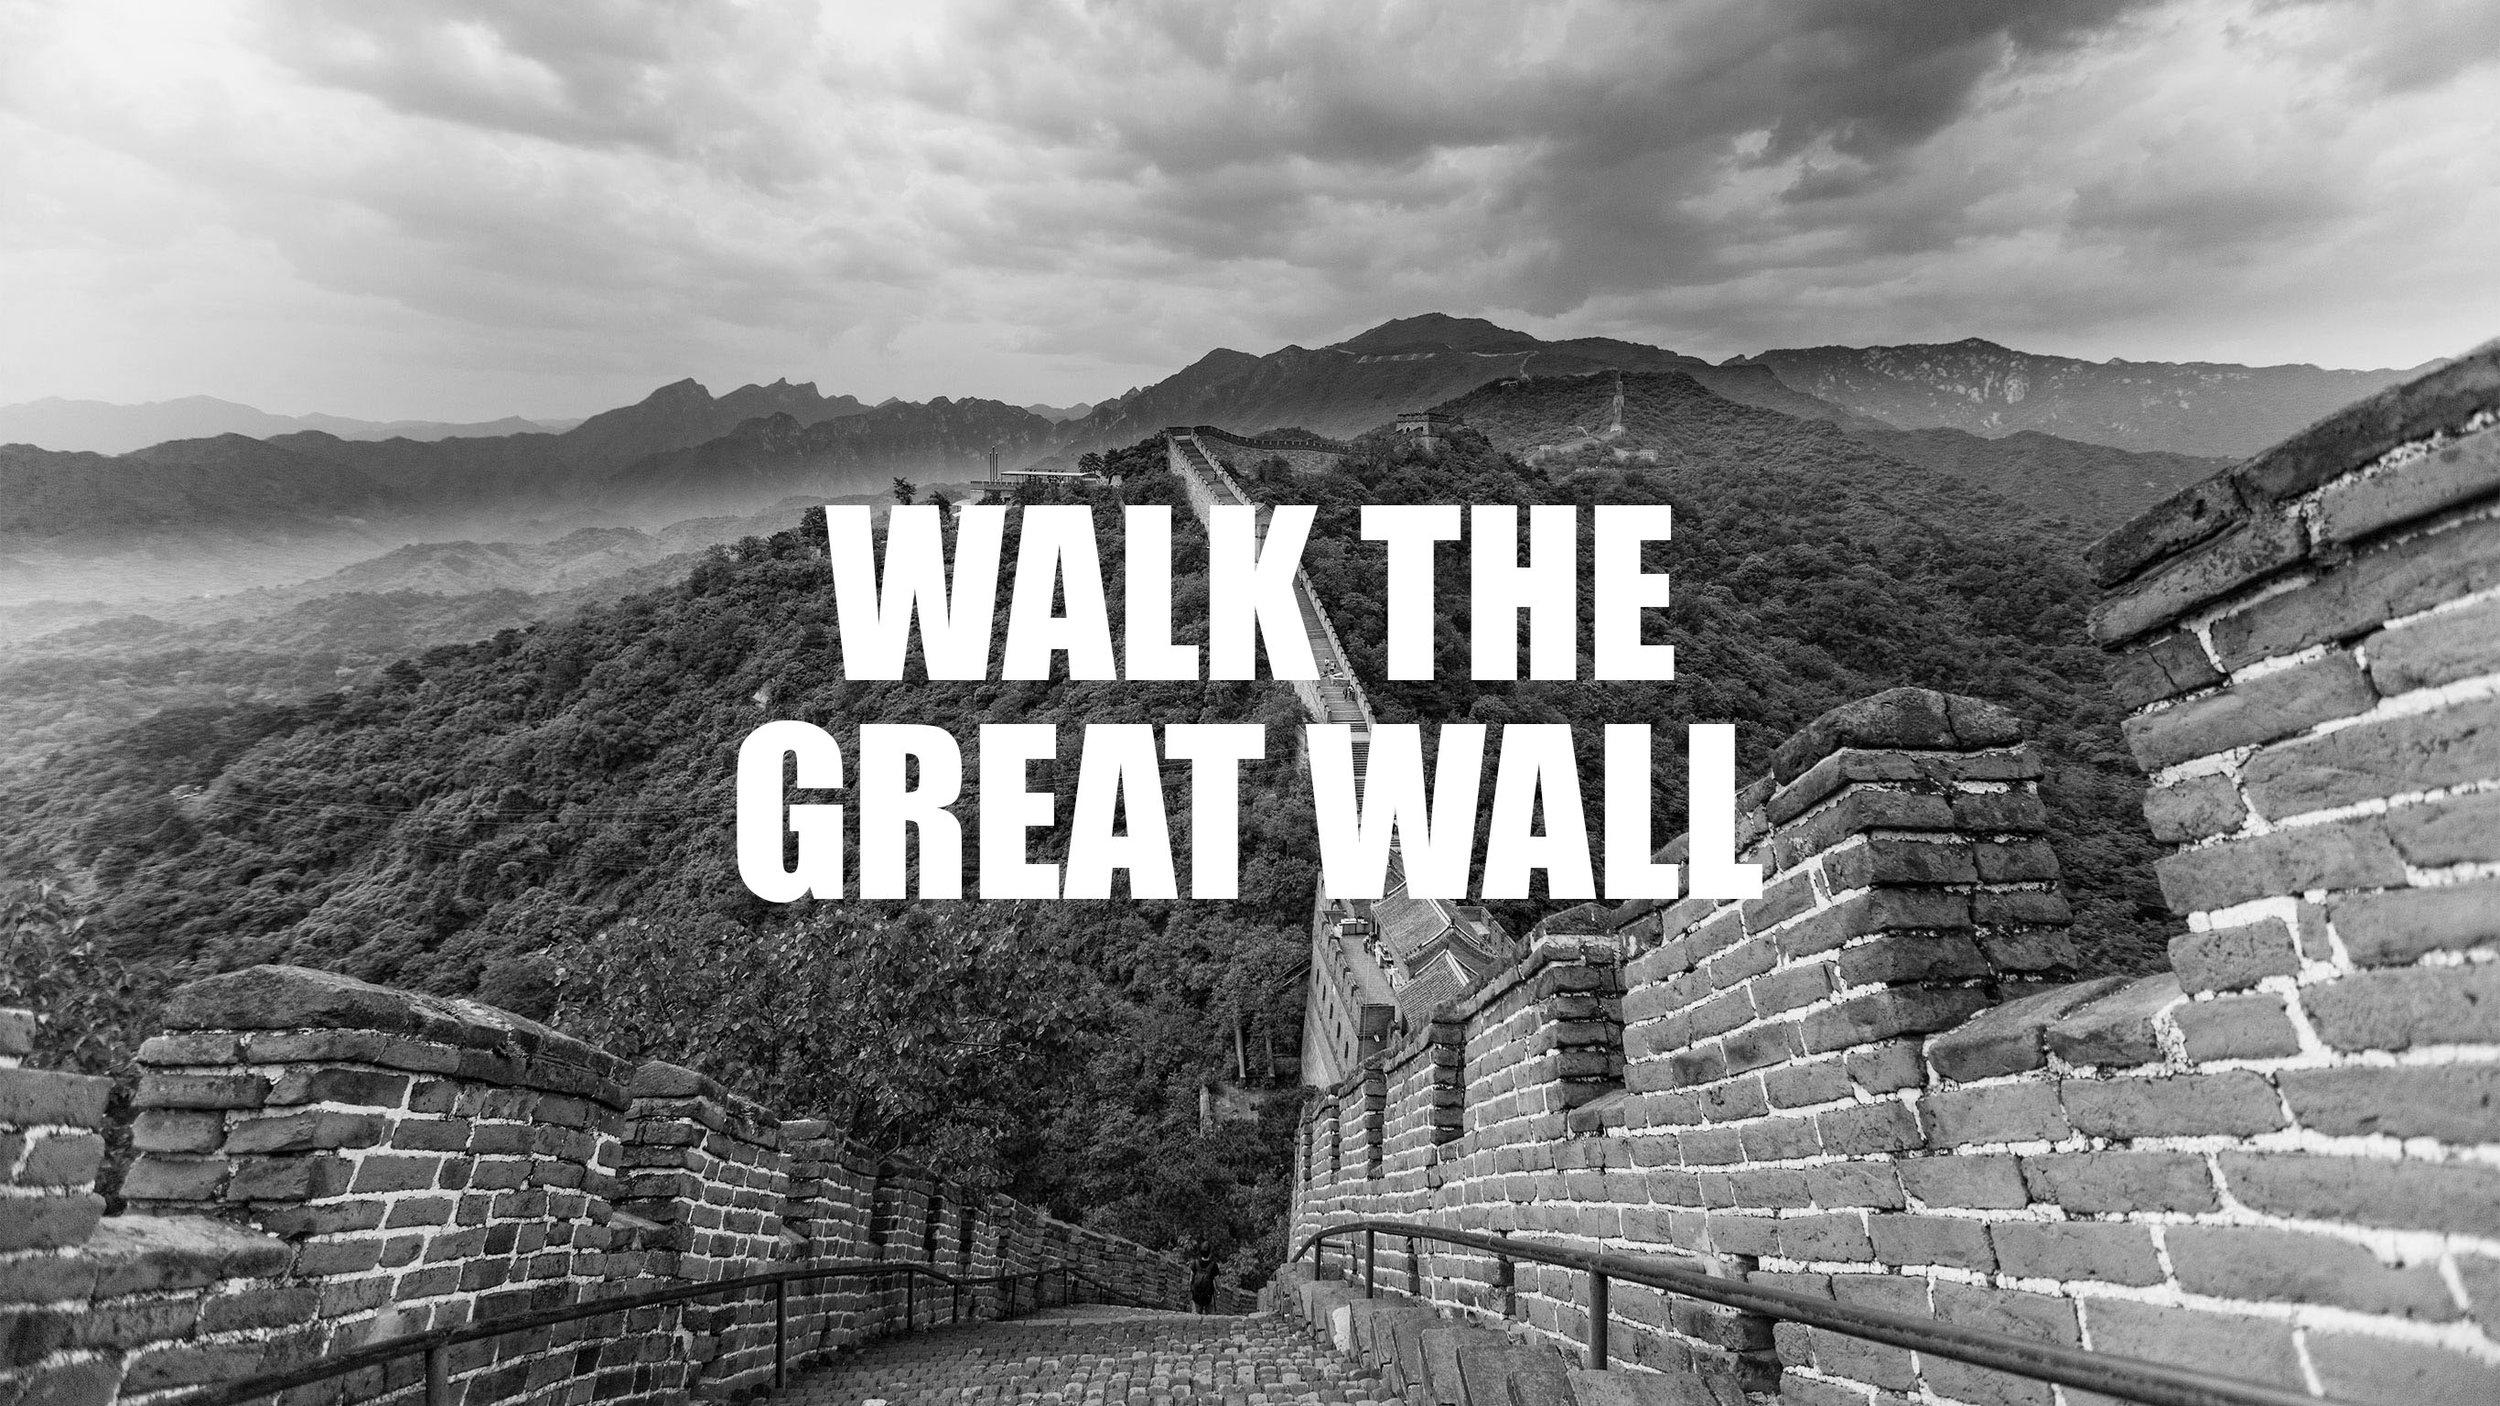 China-Beijing-Great-Wall-Landscape-Attit-Patel-2013-IMG1911-Lg-RGB-web copy.jpg